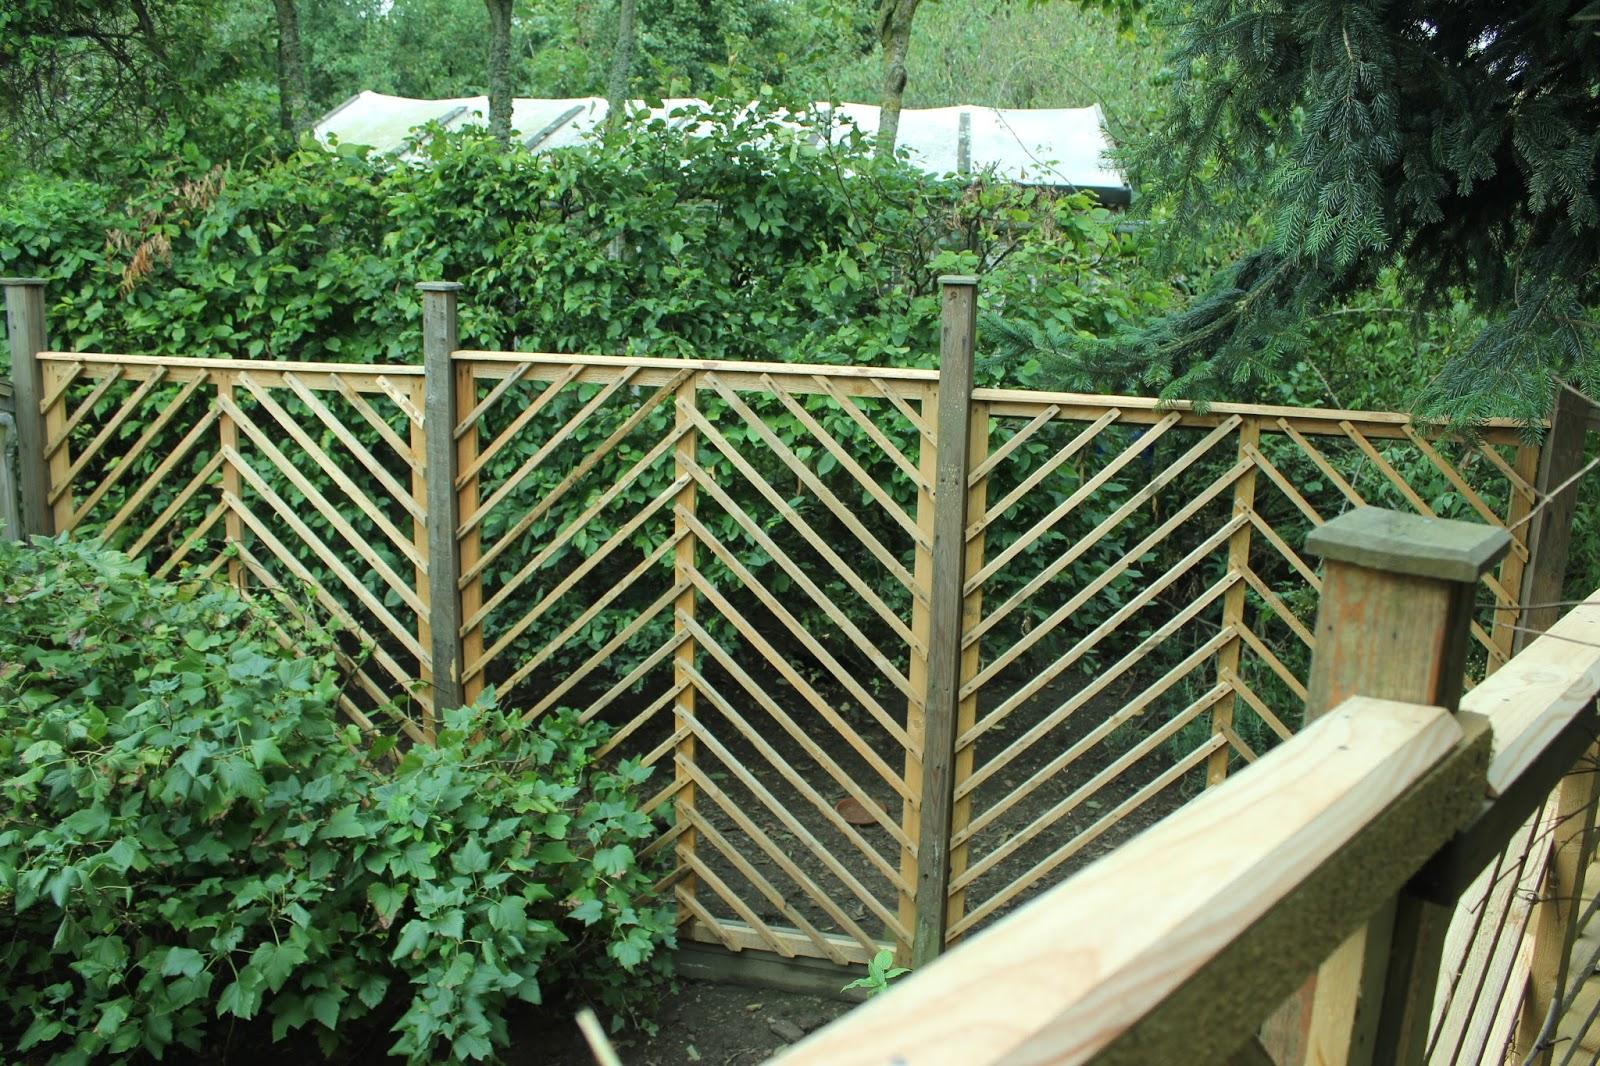 Diy garden gazebo from pallet wood part 2 trellis panels How to build a trellis